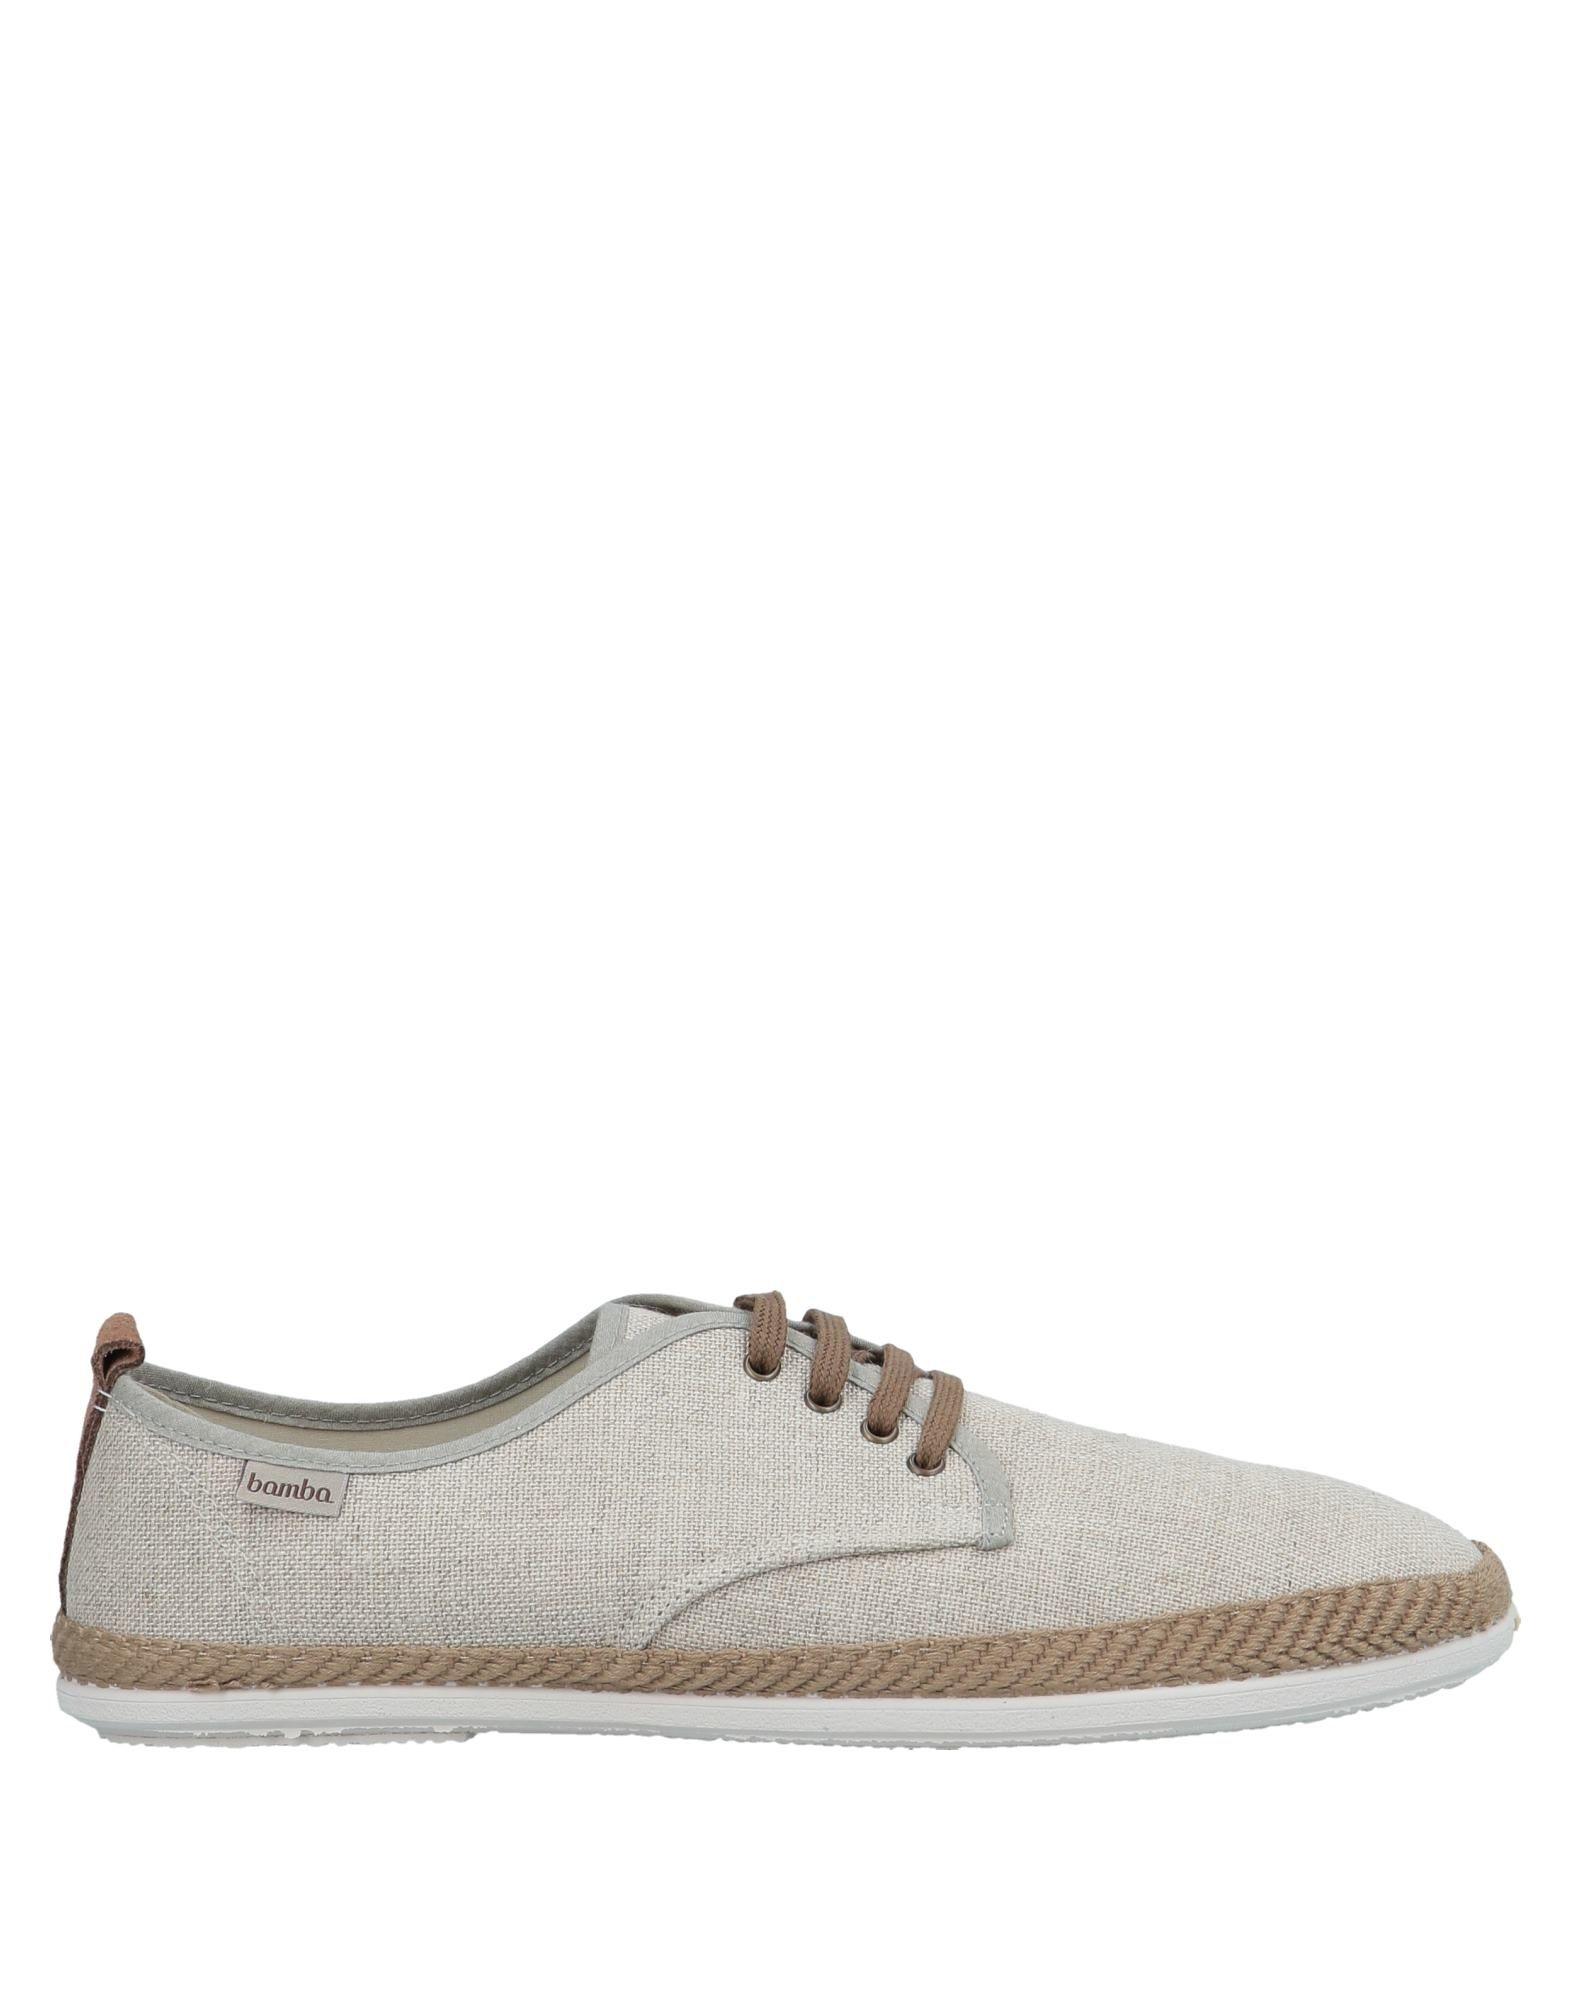 BAMBA by VICTORIA Обувь на шнурках